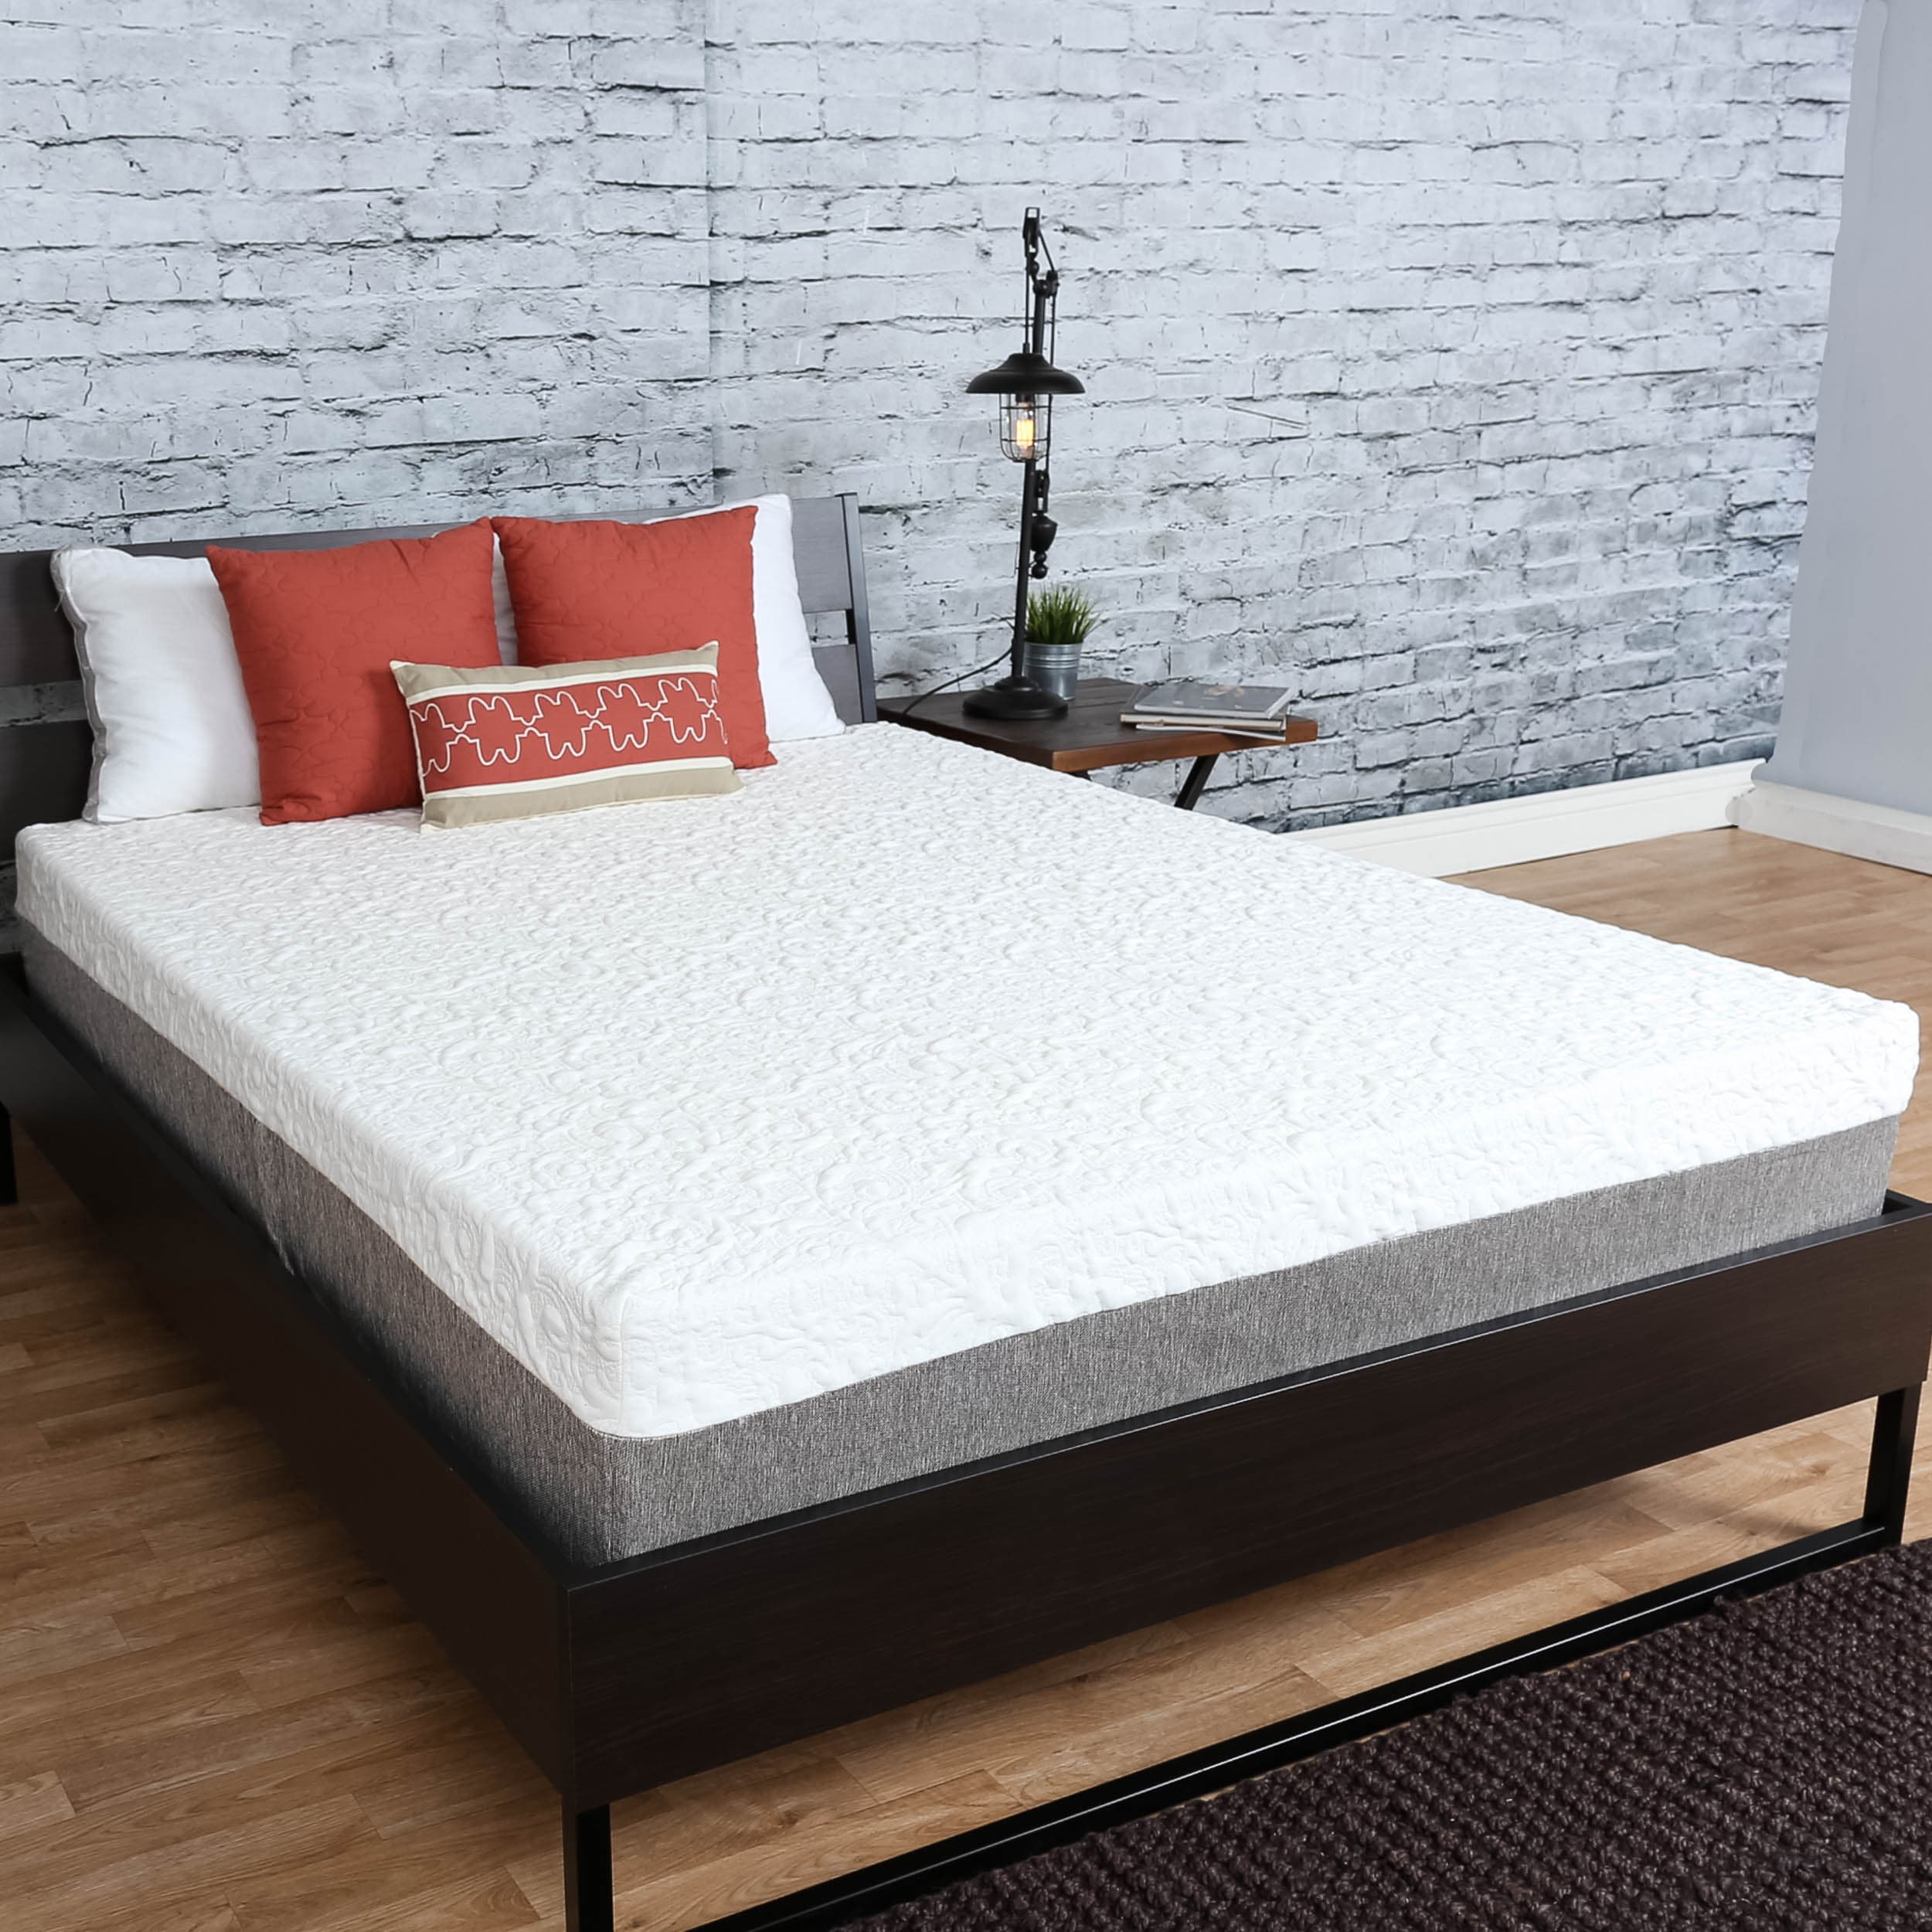 Shop Premier Sleep Products 12 Inch Plush Gel Memory Foam Mattress